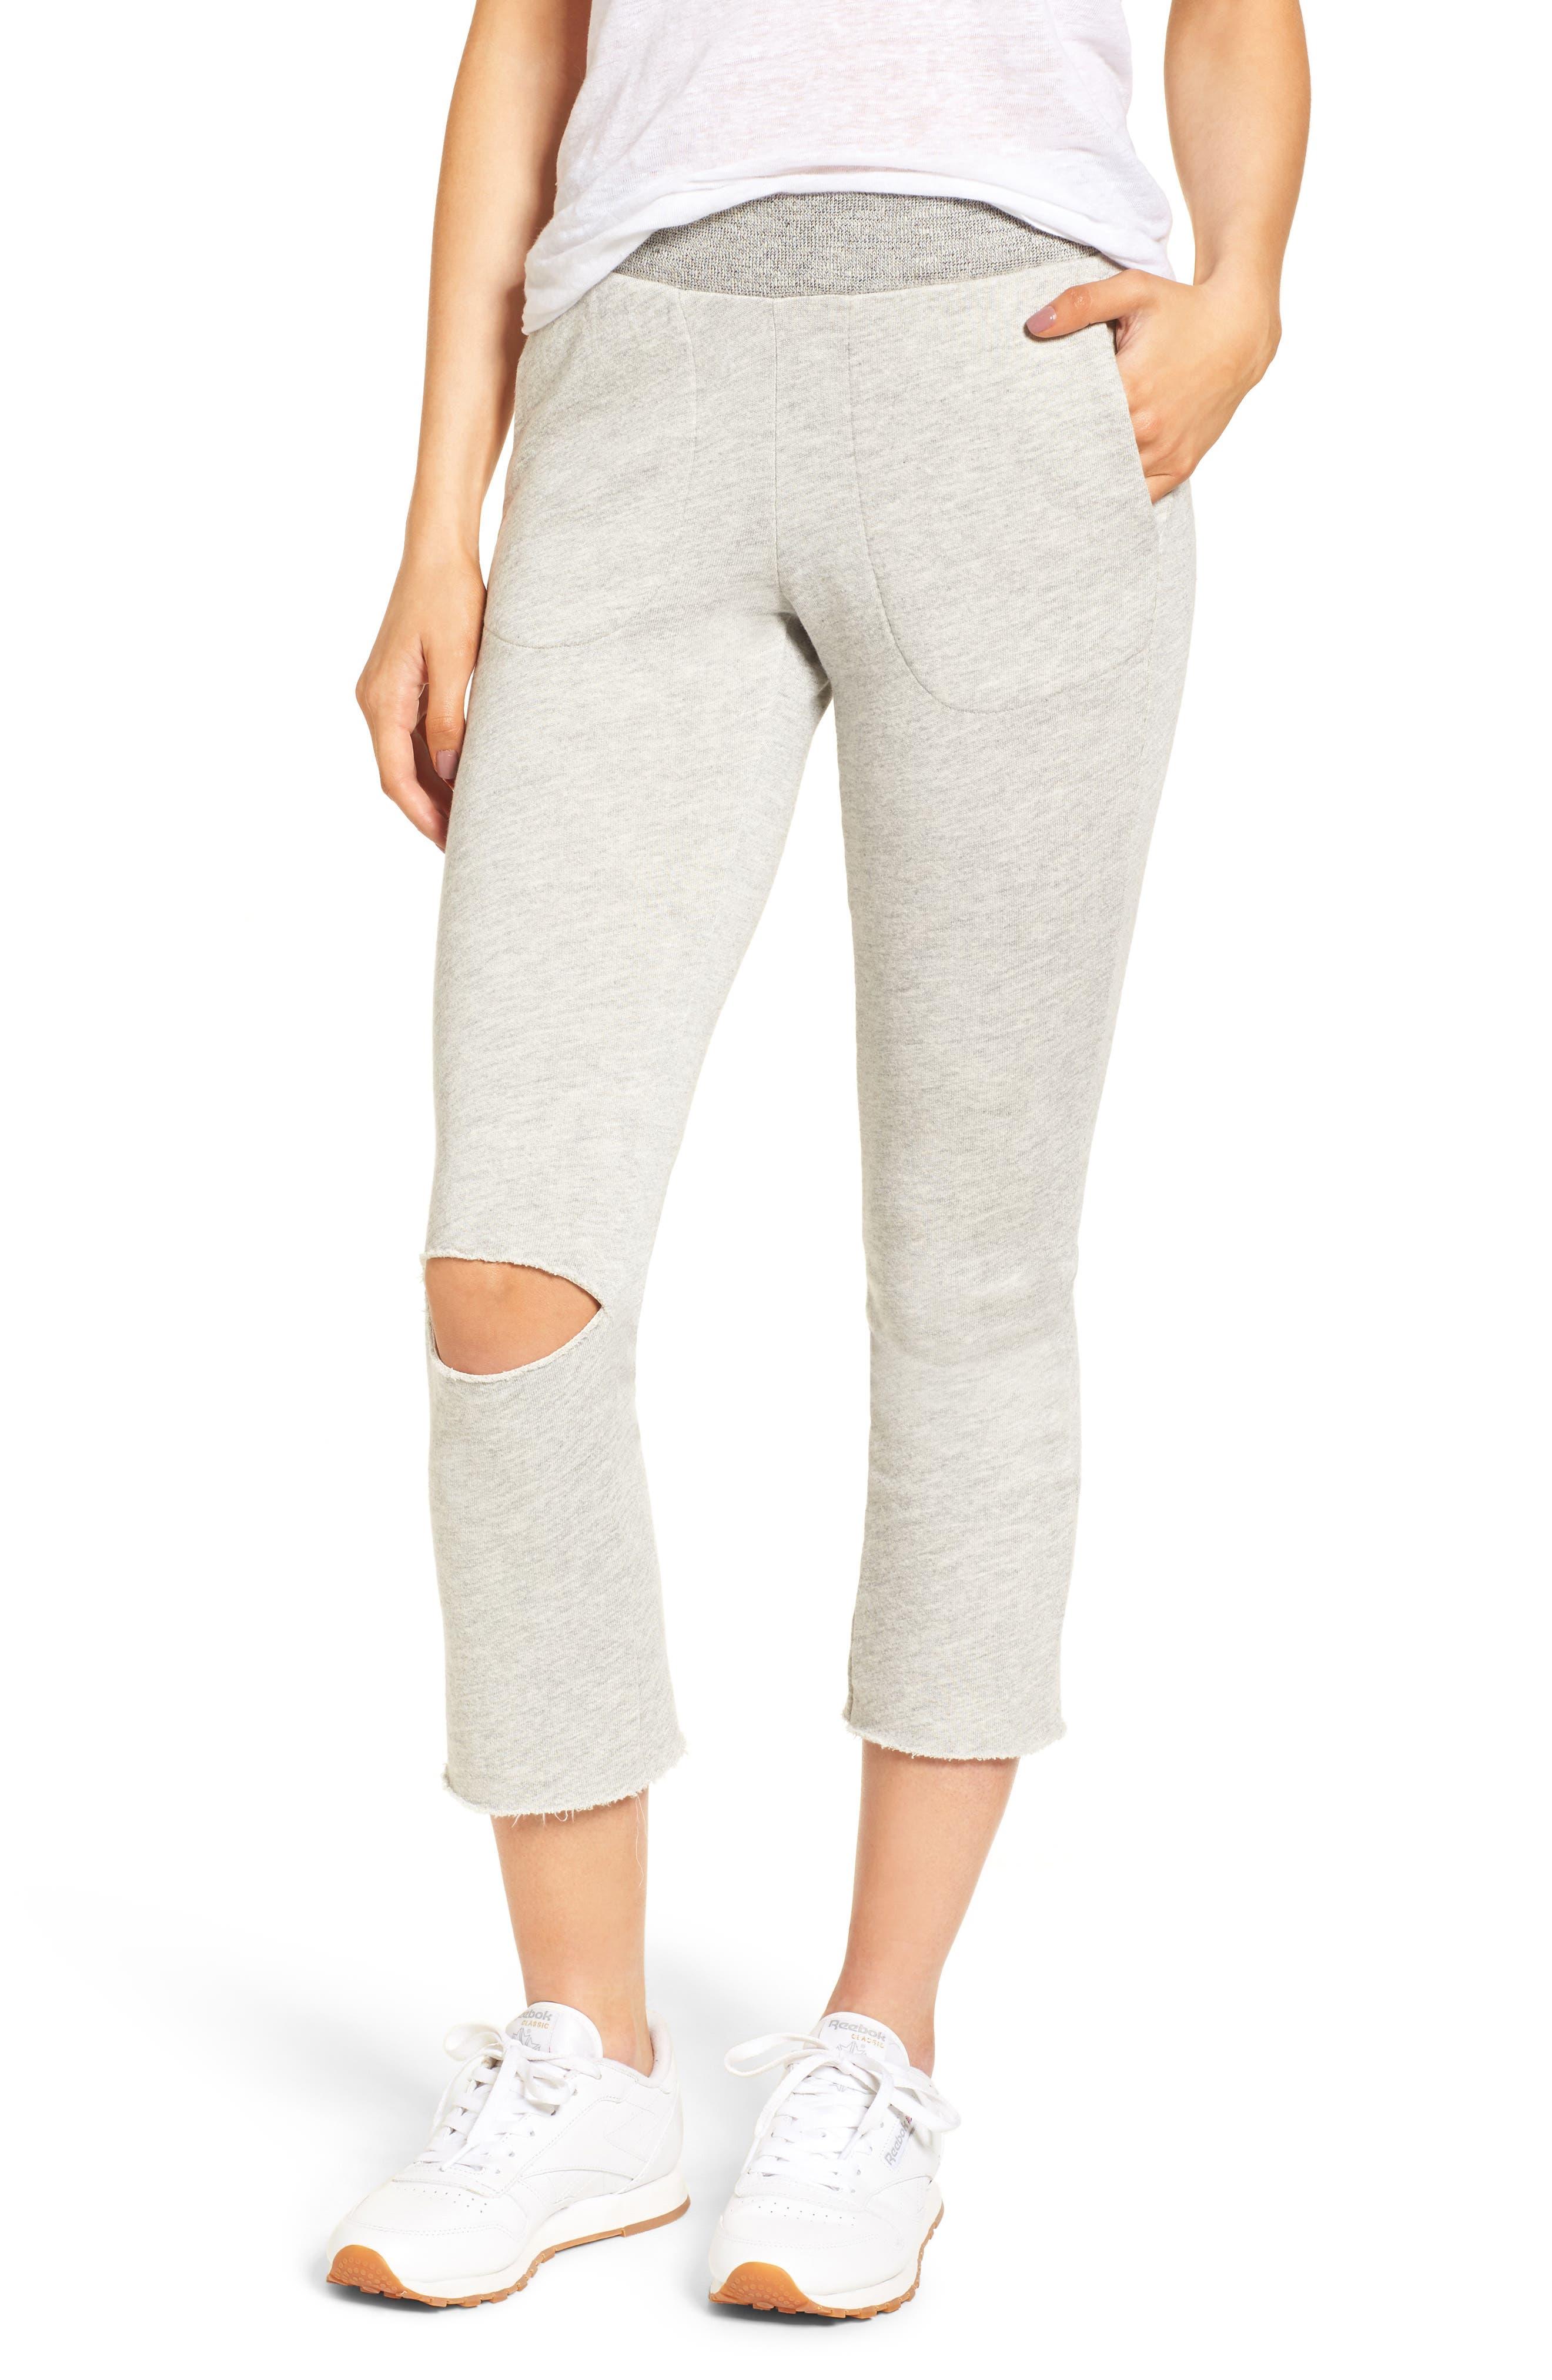 Malibu Slit Knee Sweatpants,                             Main thumbnail 1, color,                             030